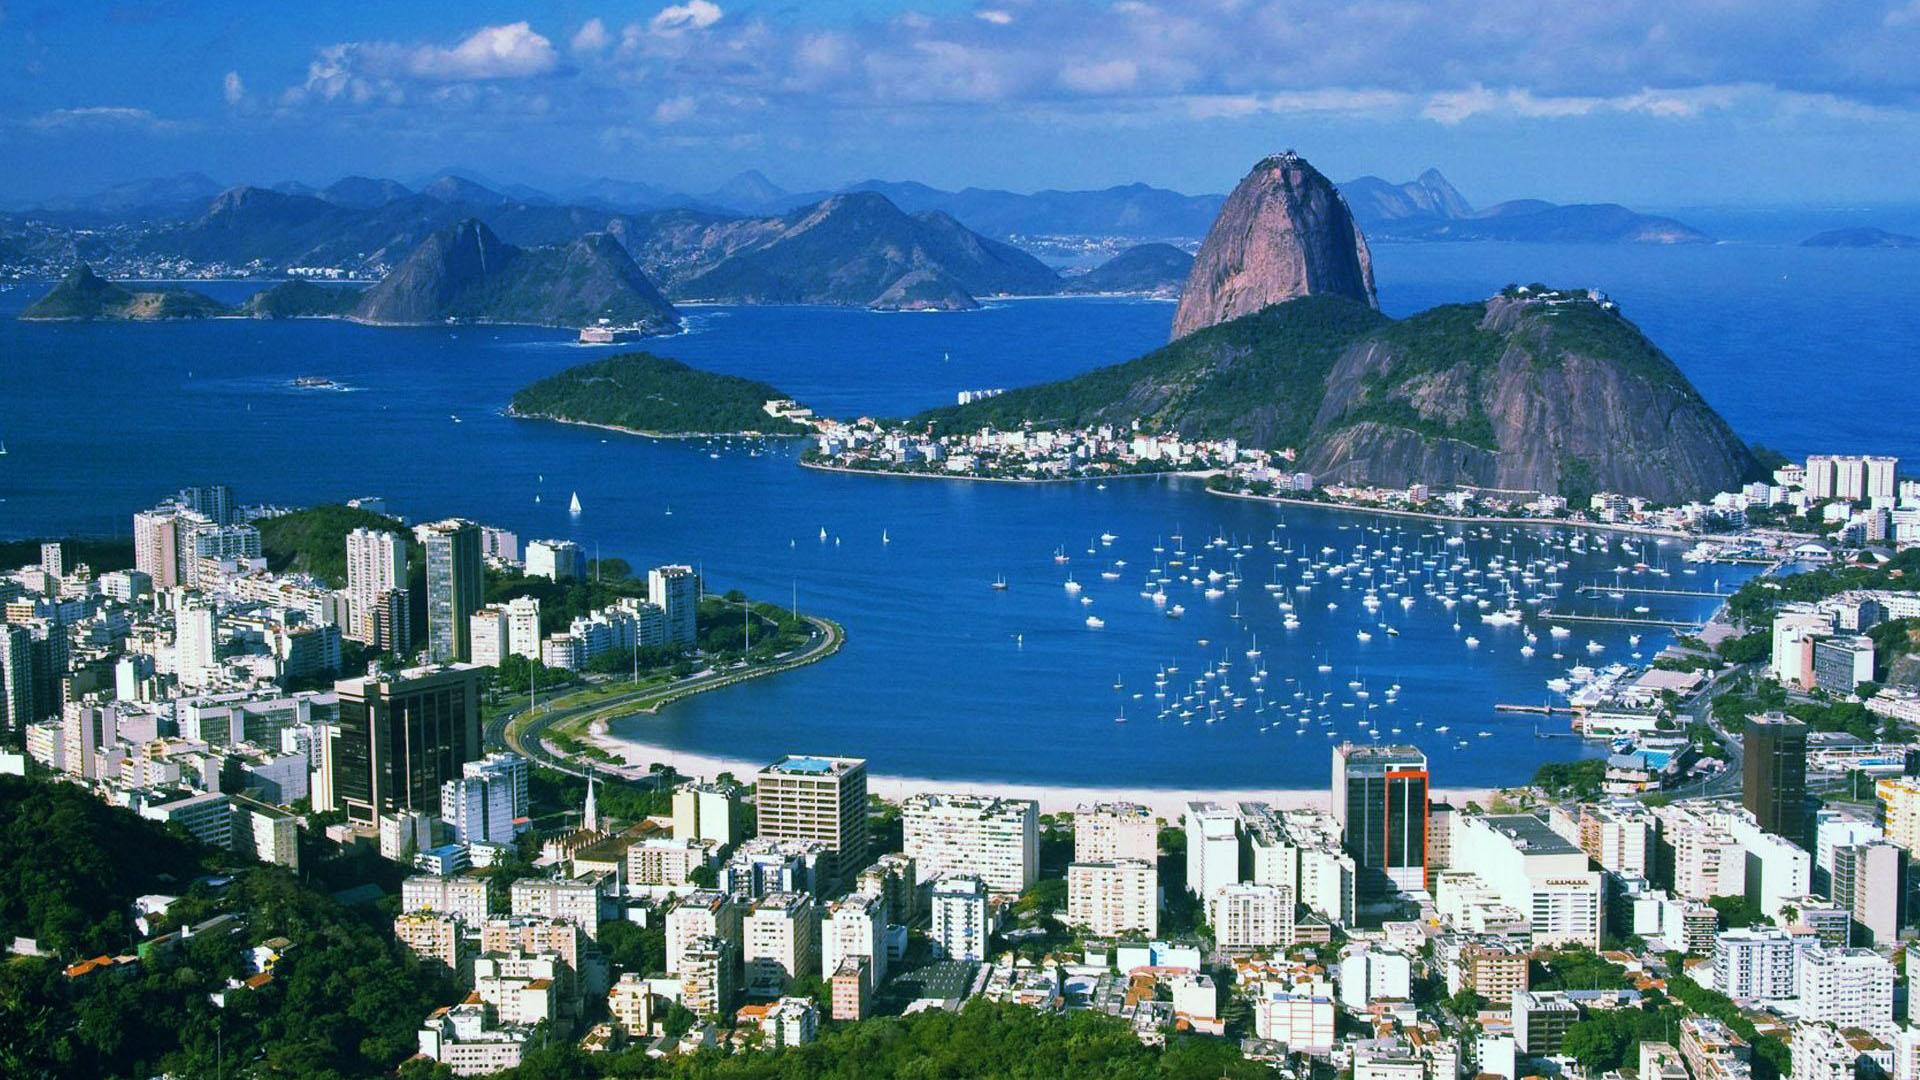 Cute Pink Wallpaper Quotes Rio De Janeiro Wallpaper 1920x1080 12980 Wallpaper